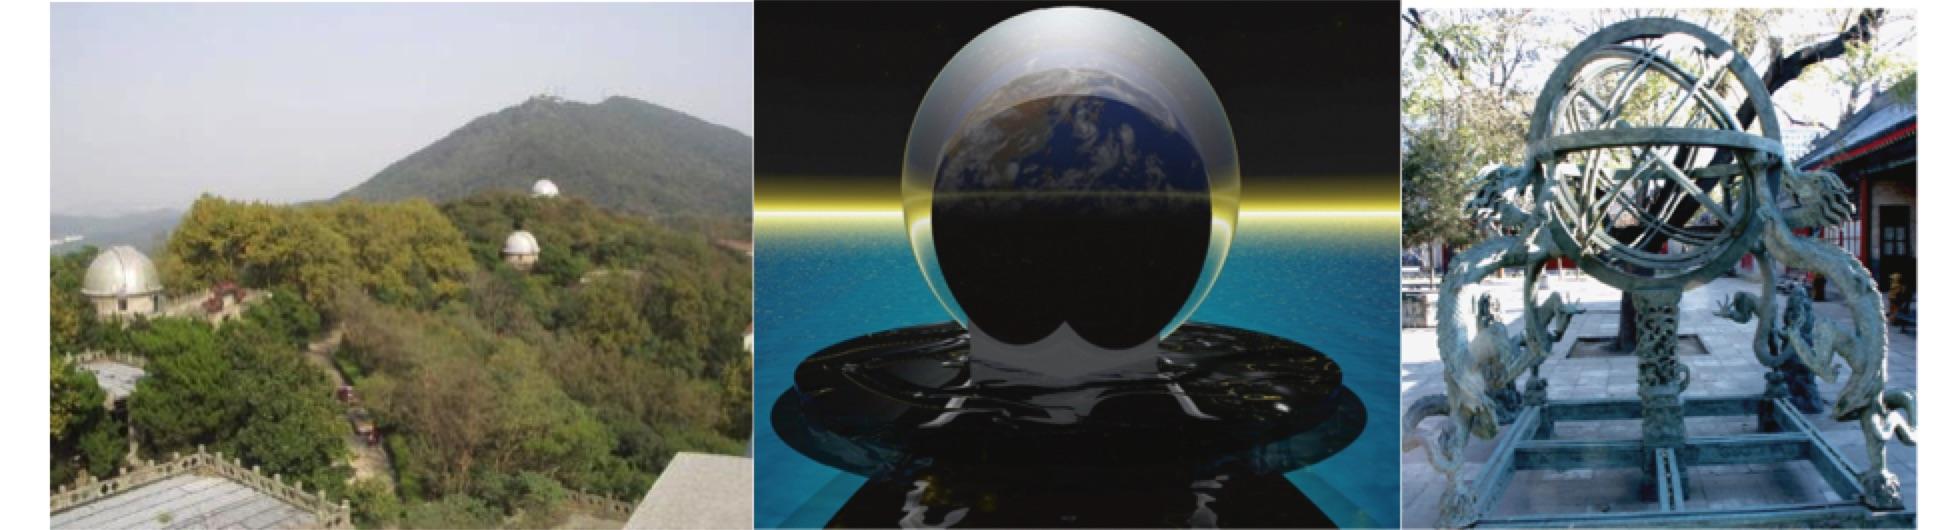 Ancient and Modern Chinese Universe | Bryan Penprase